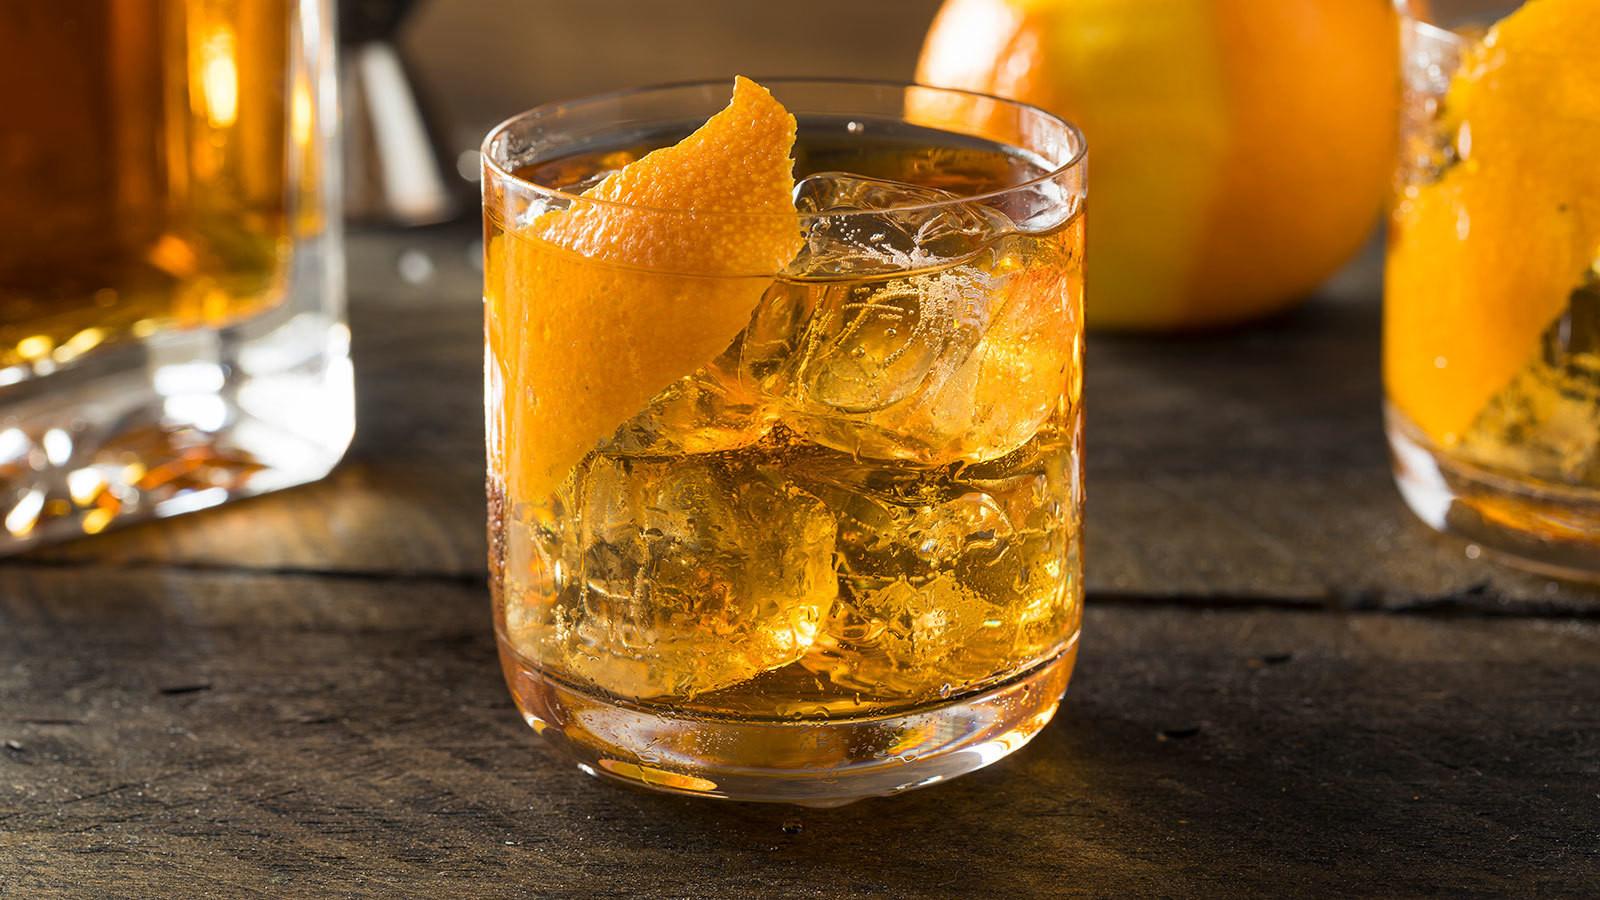 Whiskey Mixed Drinks  Whiskey Cocktails The Manhattan Old Fashioned Sazerac